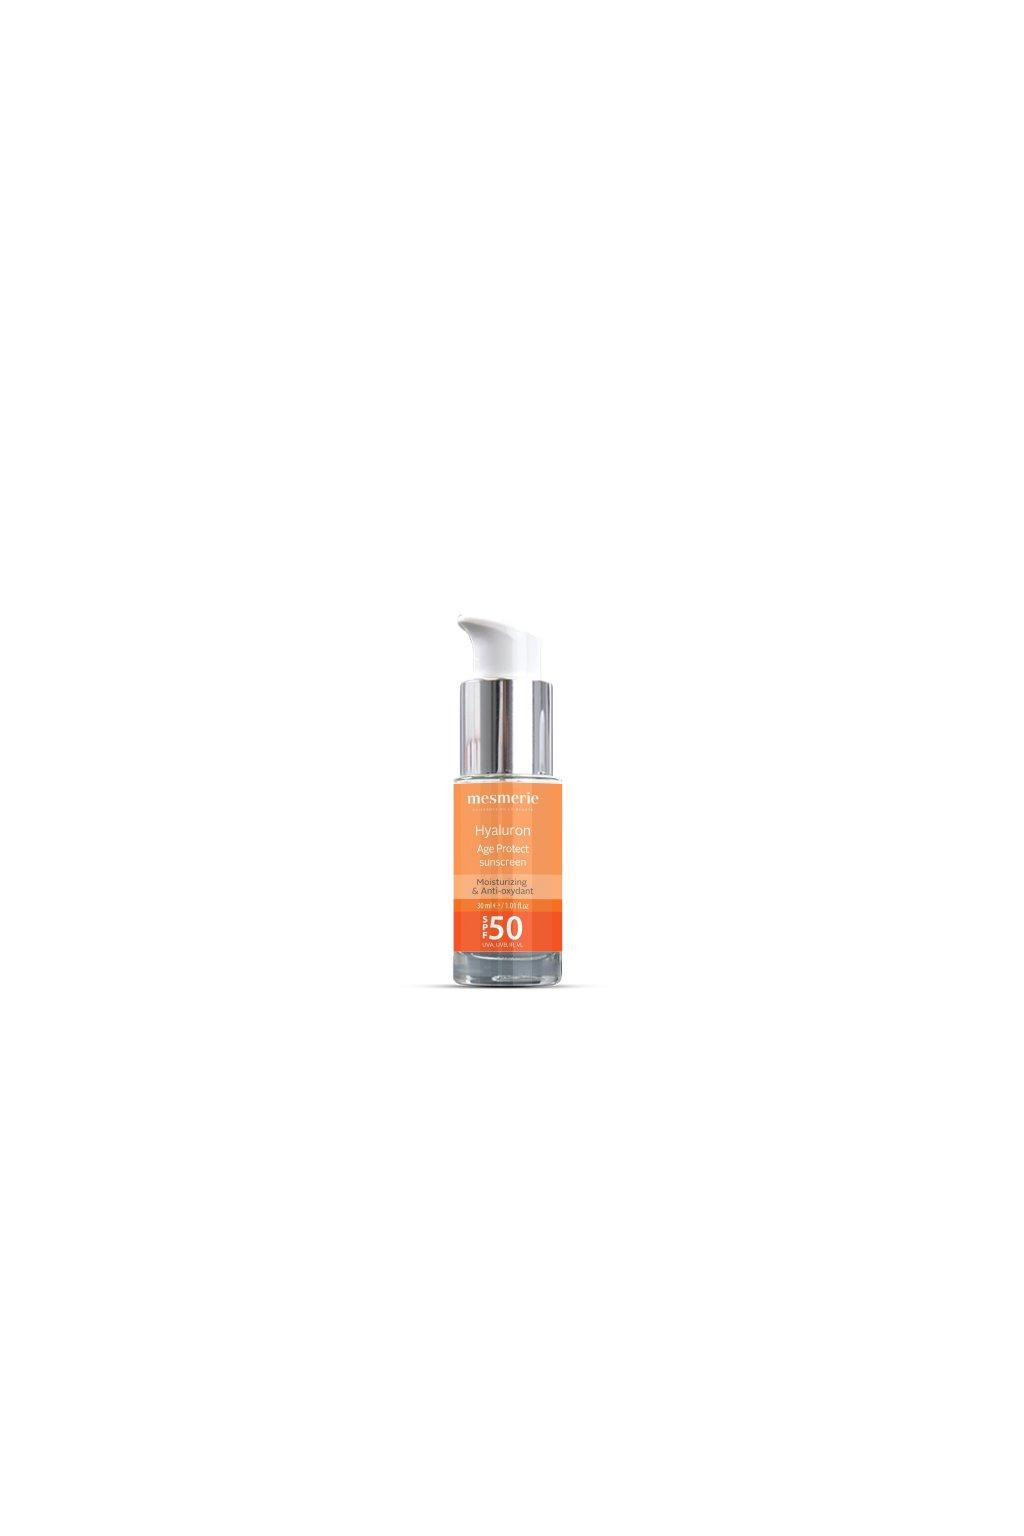 HYALURON AGE PROTECT SPF 50 Cream 30 ml